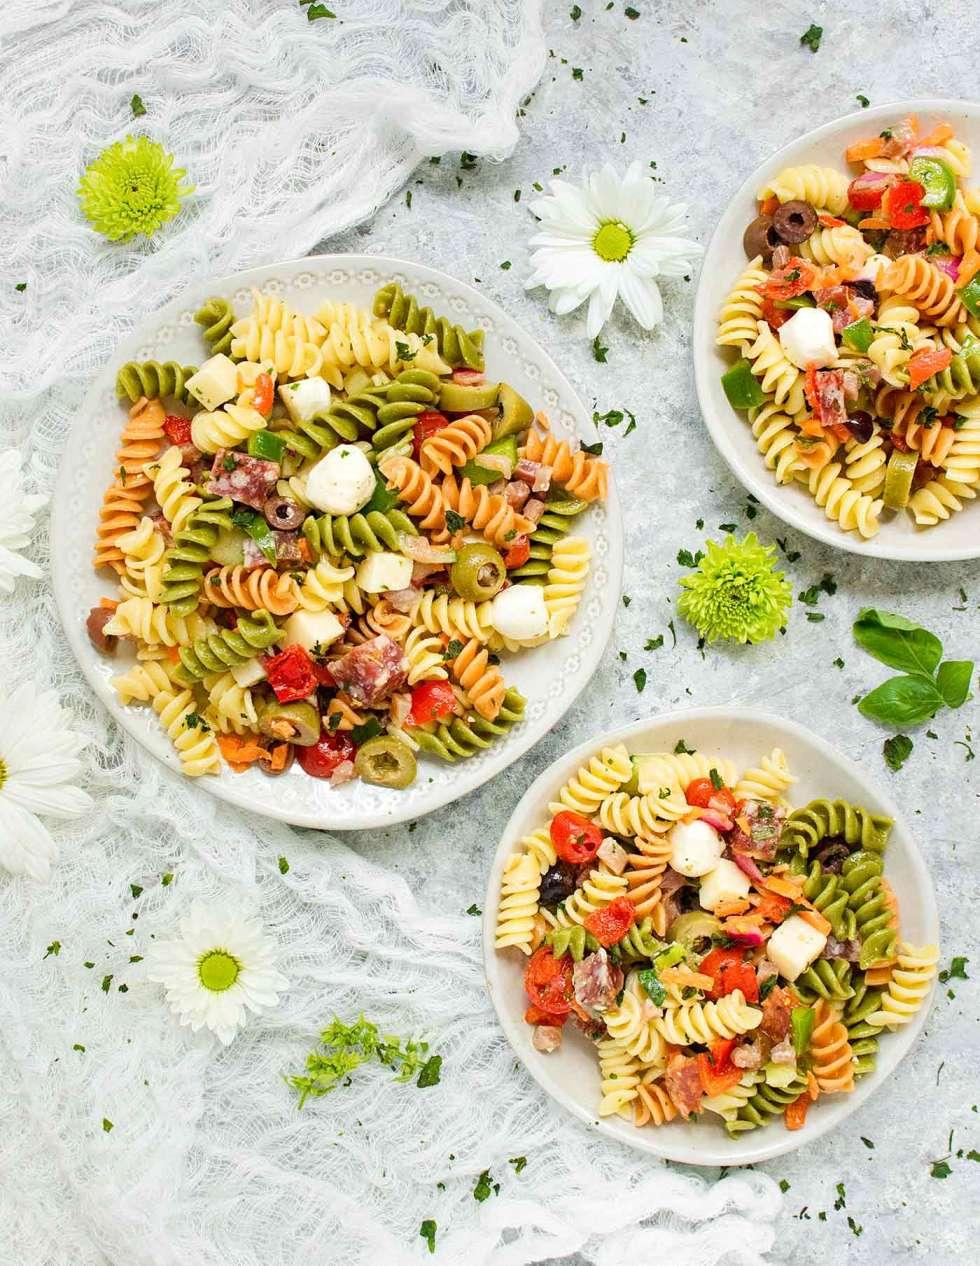 Three plates of Italian Pasta Salad